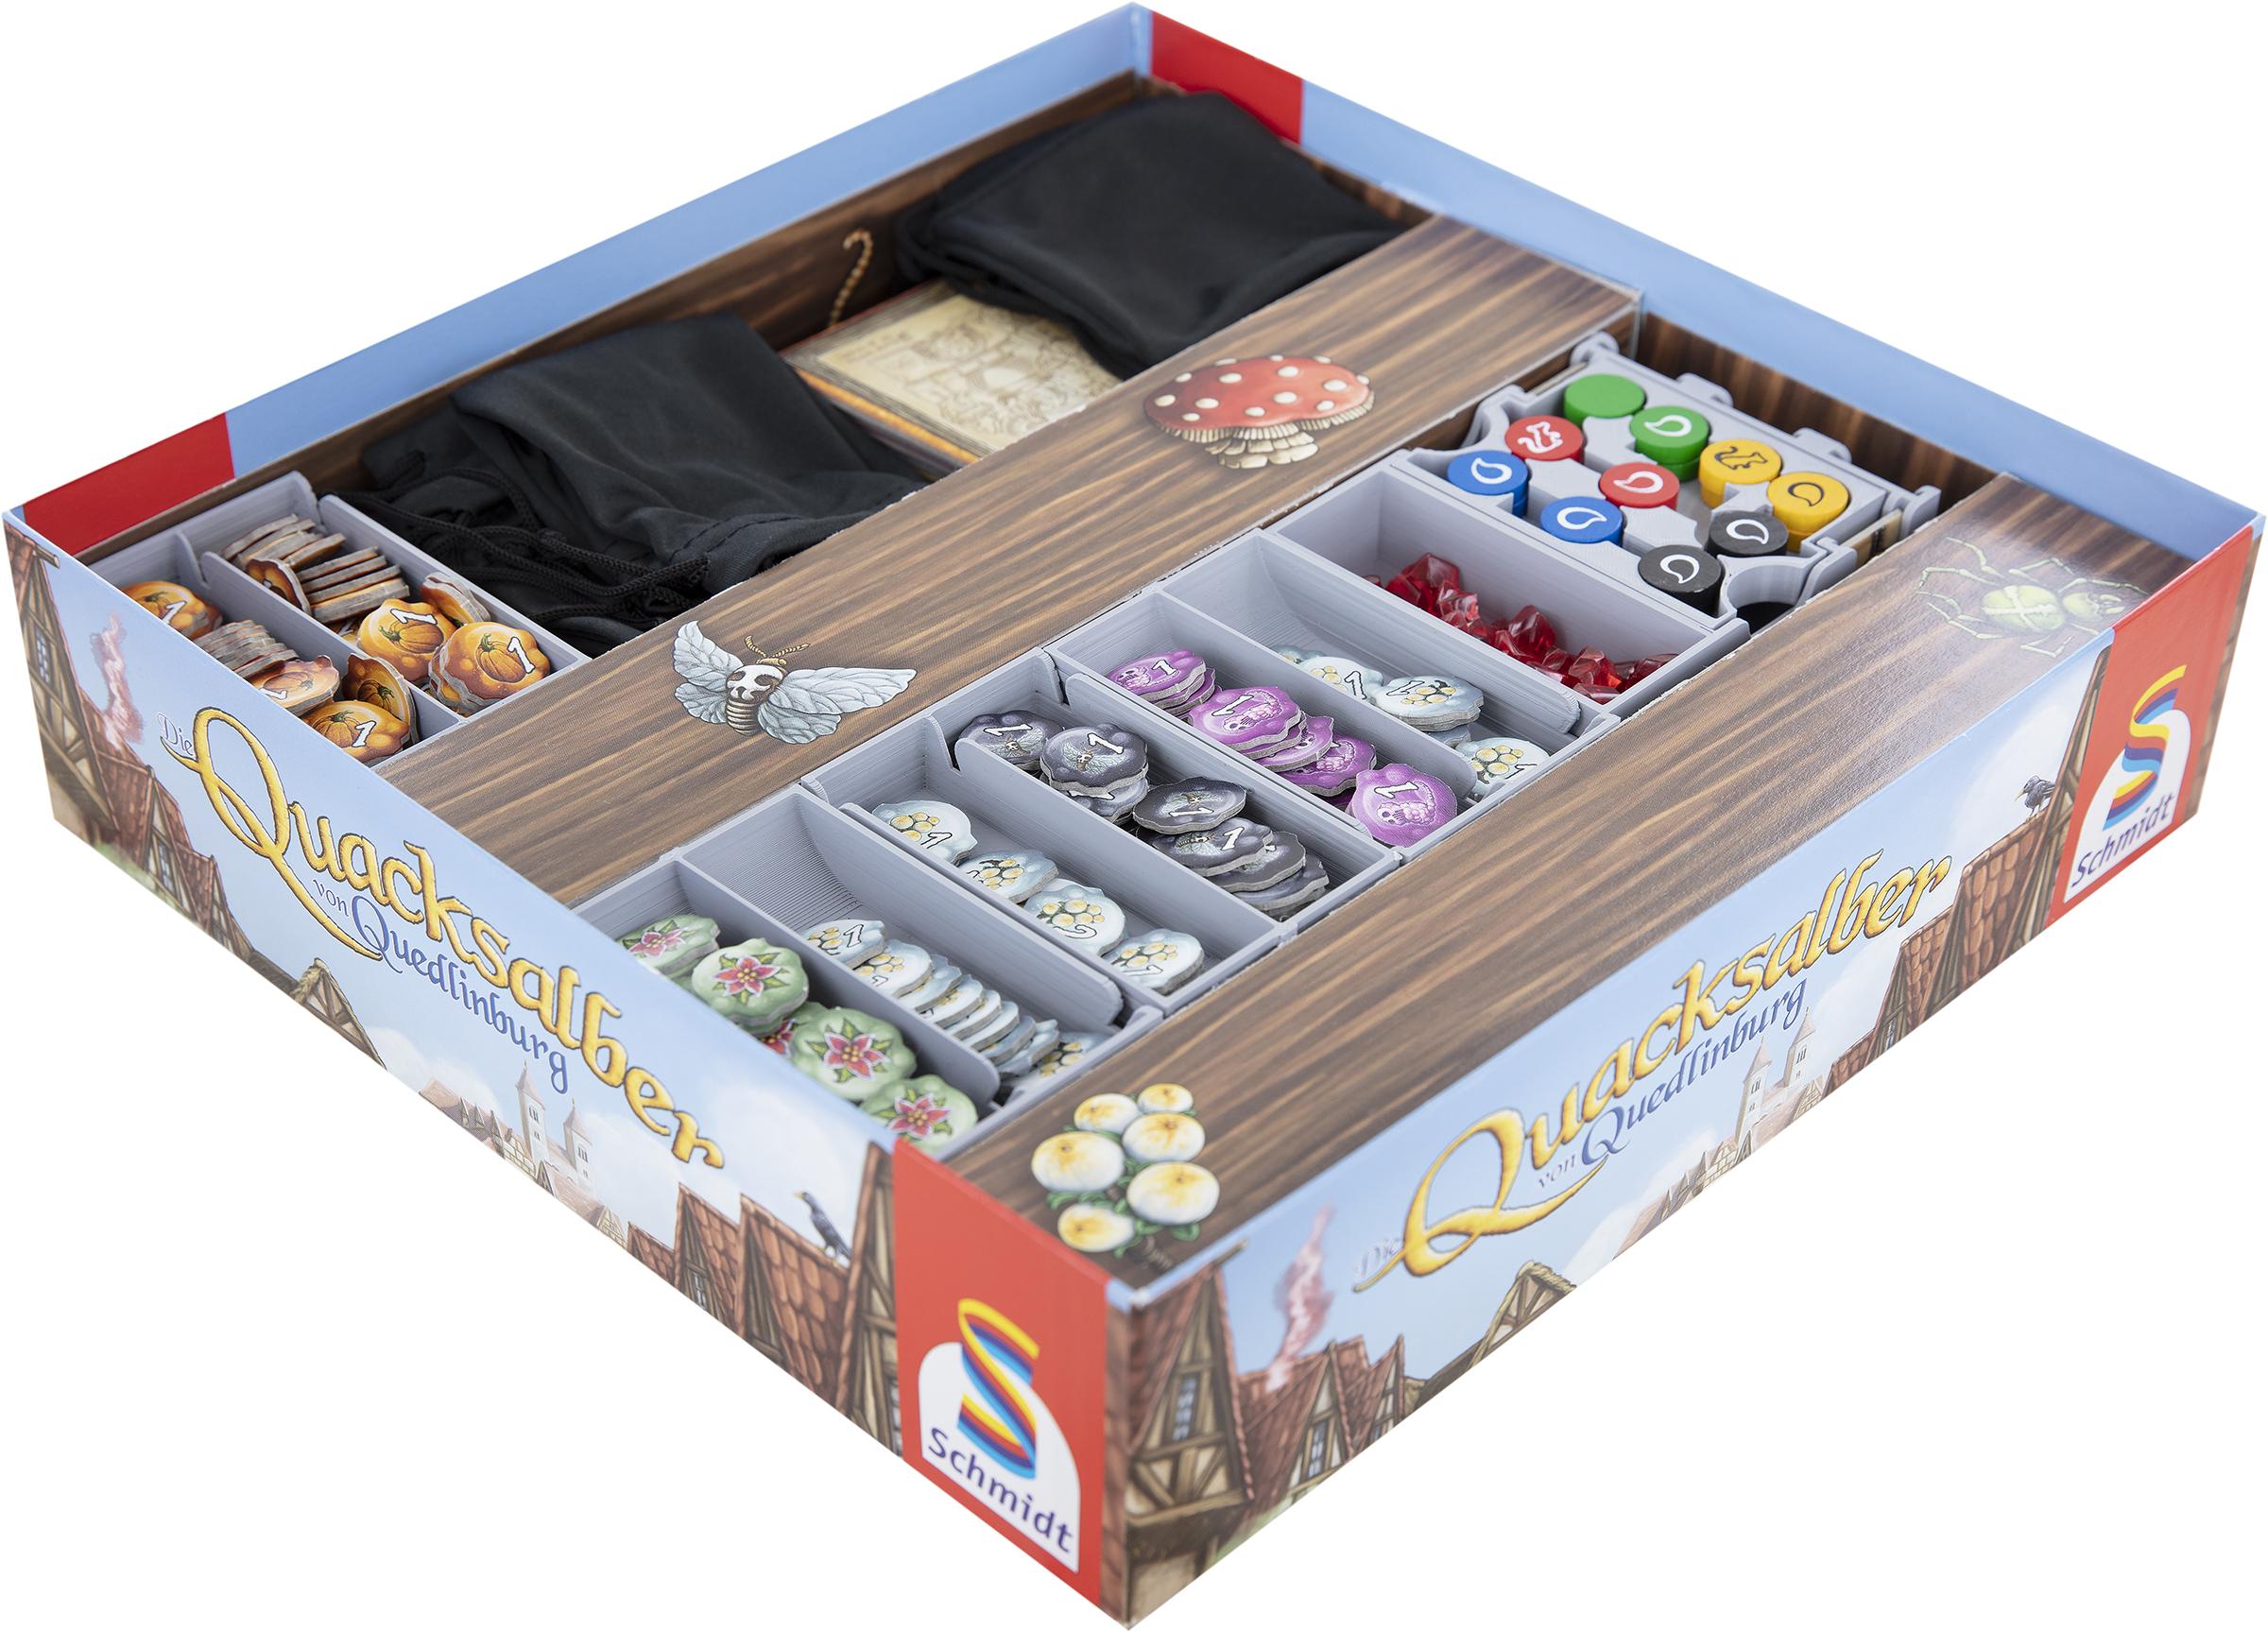 Feldherr Organizer for The Quacks of Quedlinburg - board game box